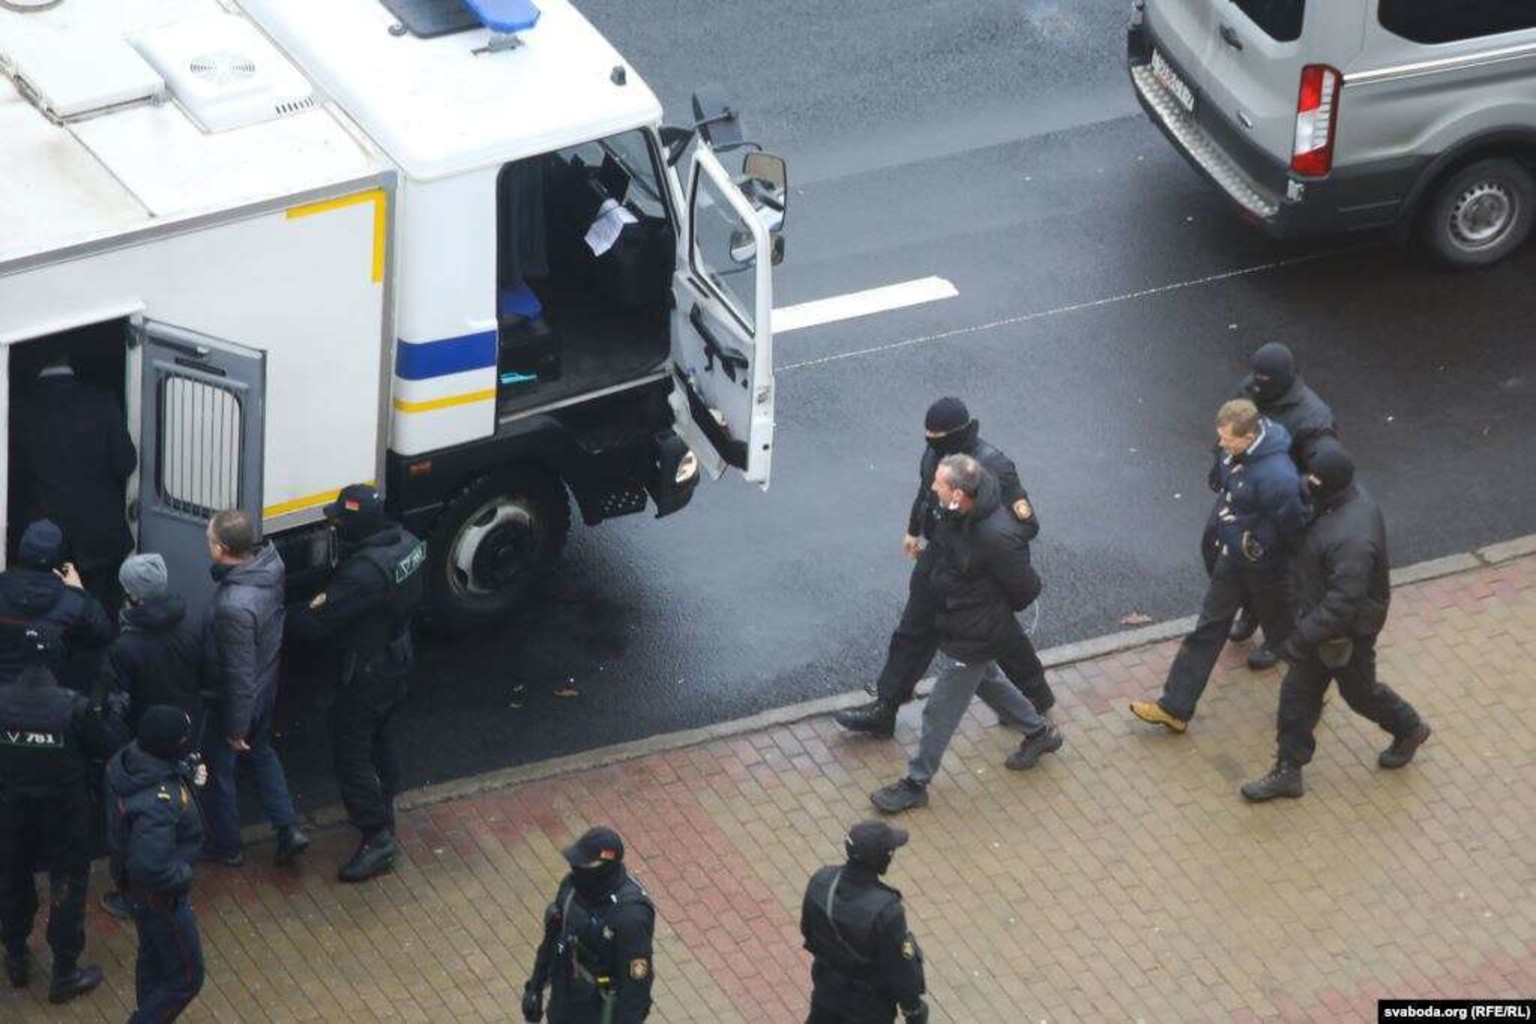 ВМинске восстановили работу интернета иметро, активистов задержали— Беспорядки сзади